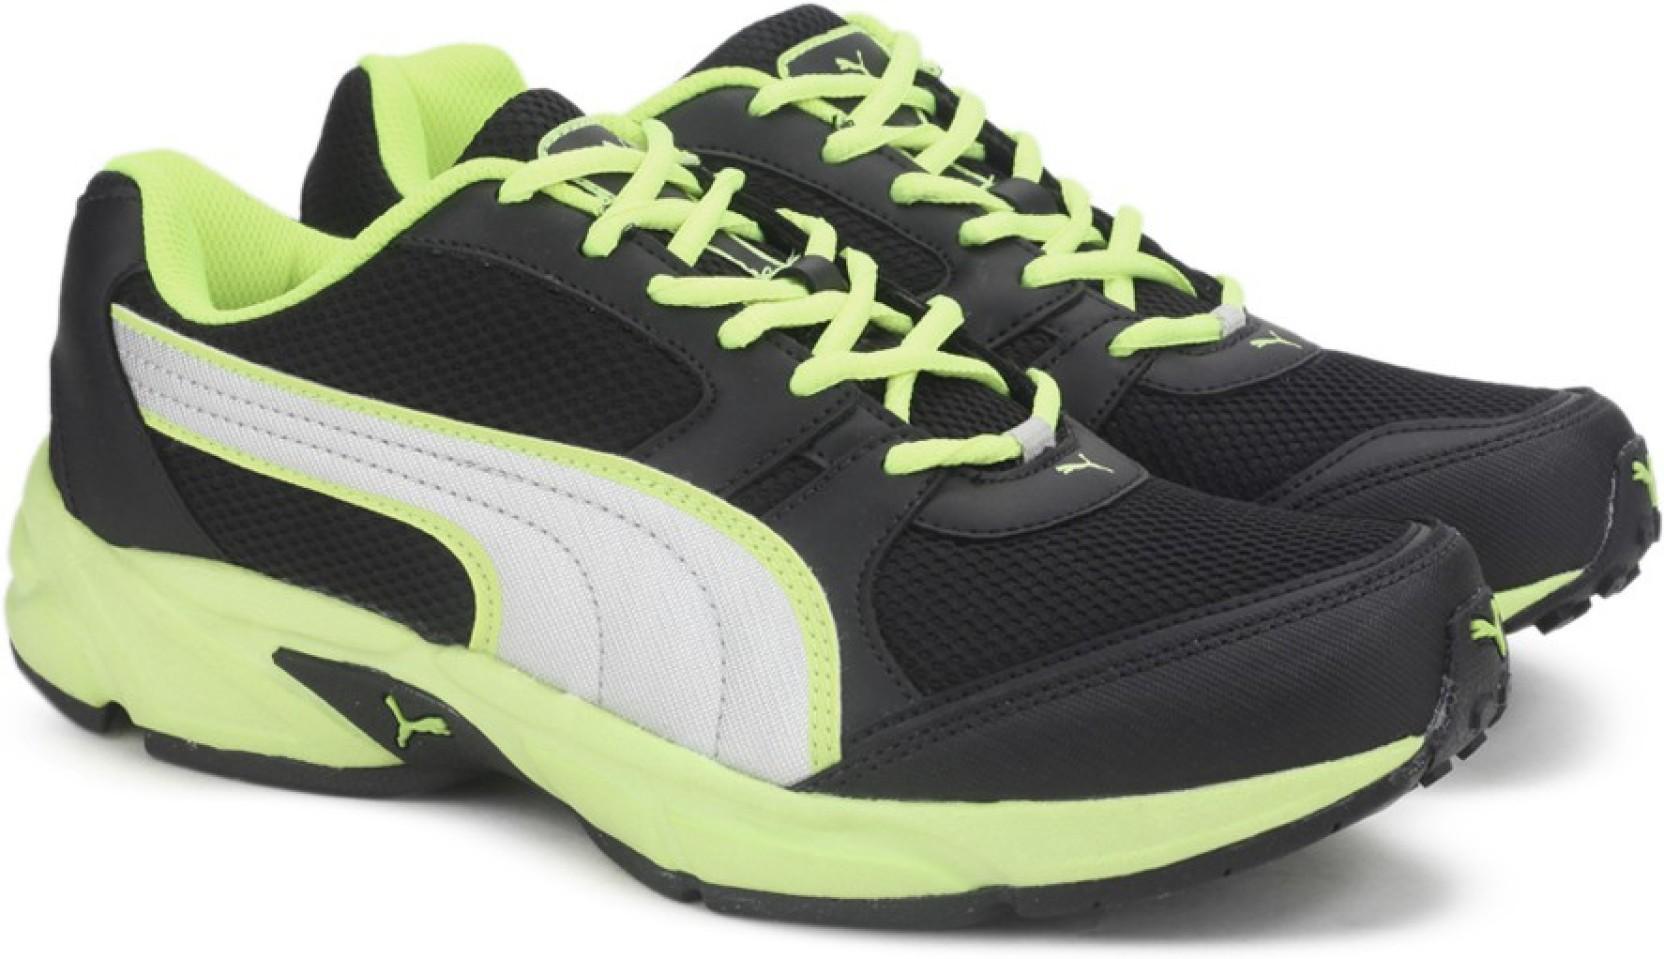 Puma Men S Atom Fashion Iii Dp Running Shoes Price